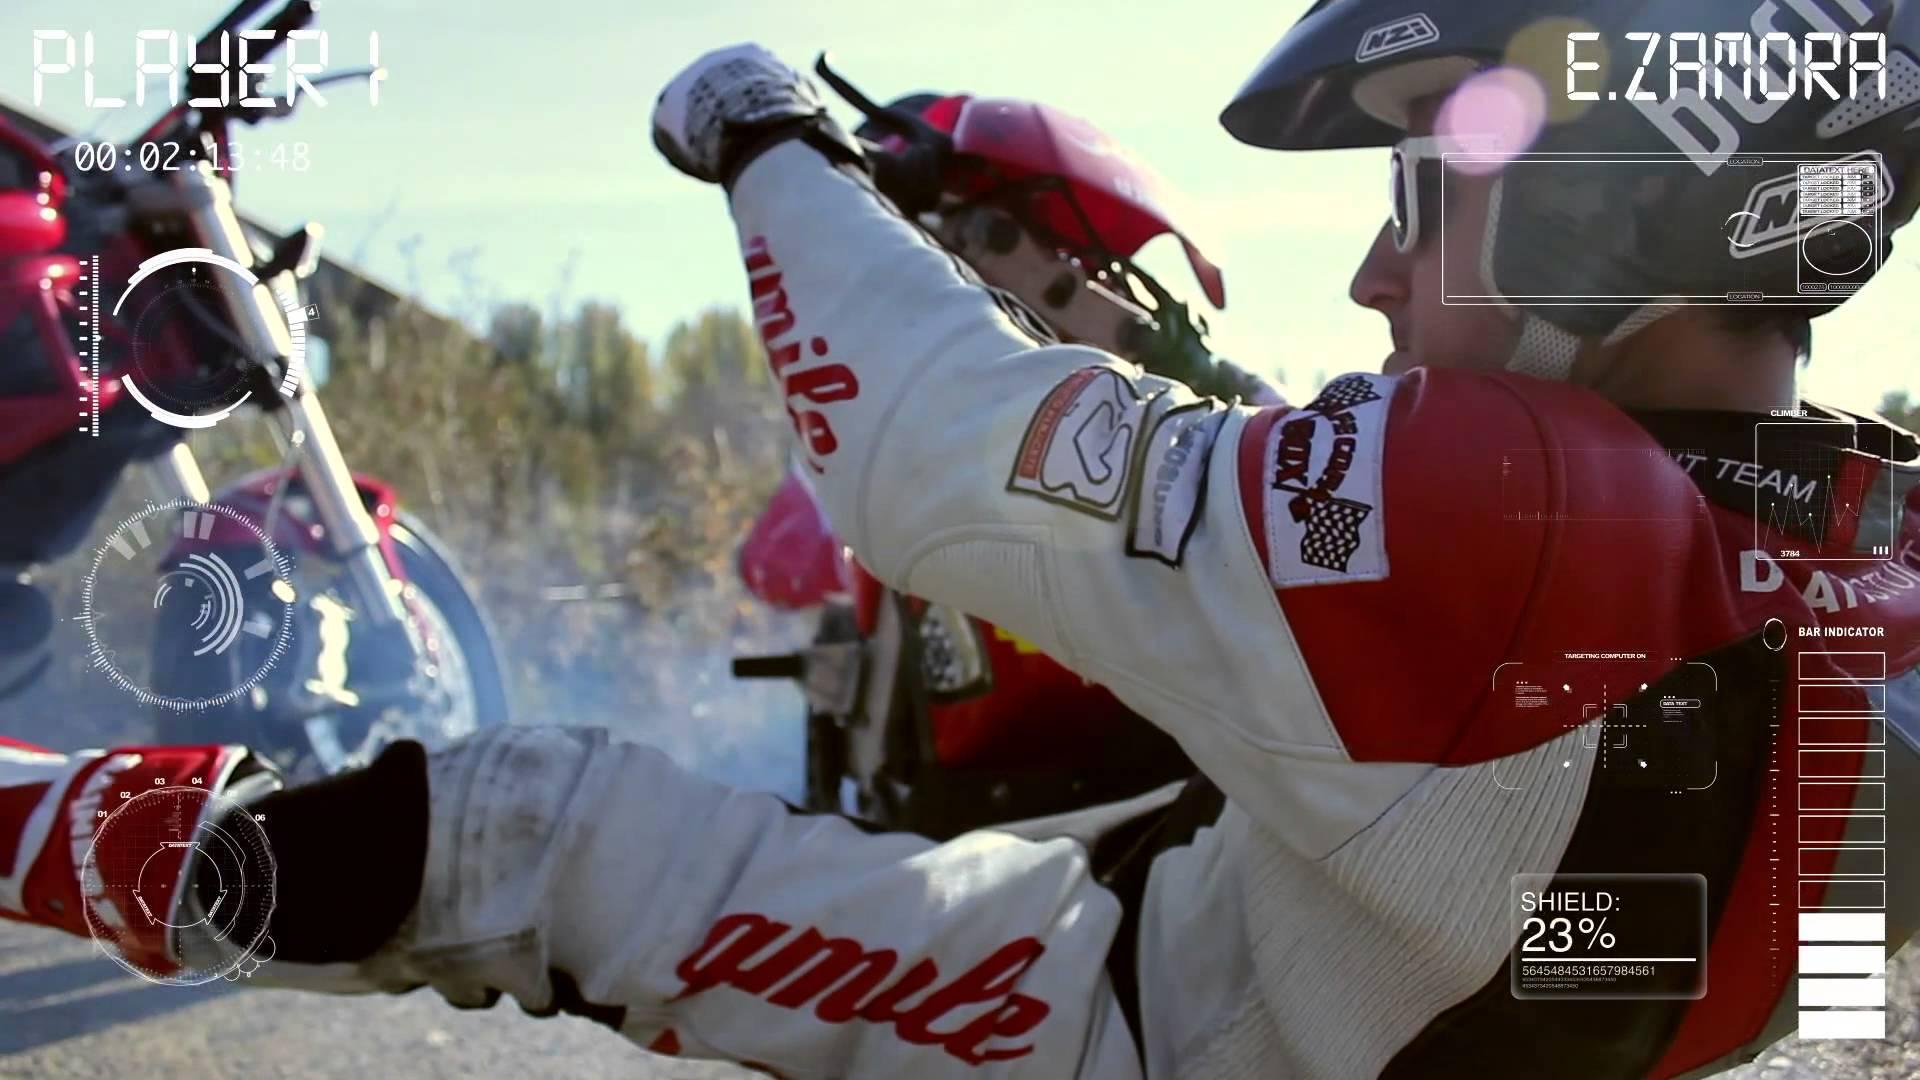 Le stunt aussi facile que dans un jeu vid o la - Jeu moto gratuit facile ...